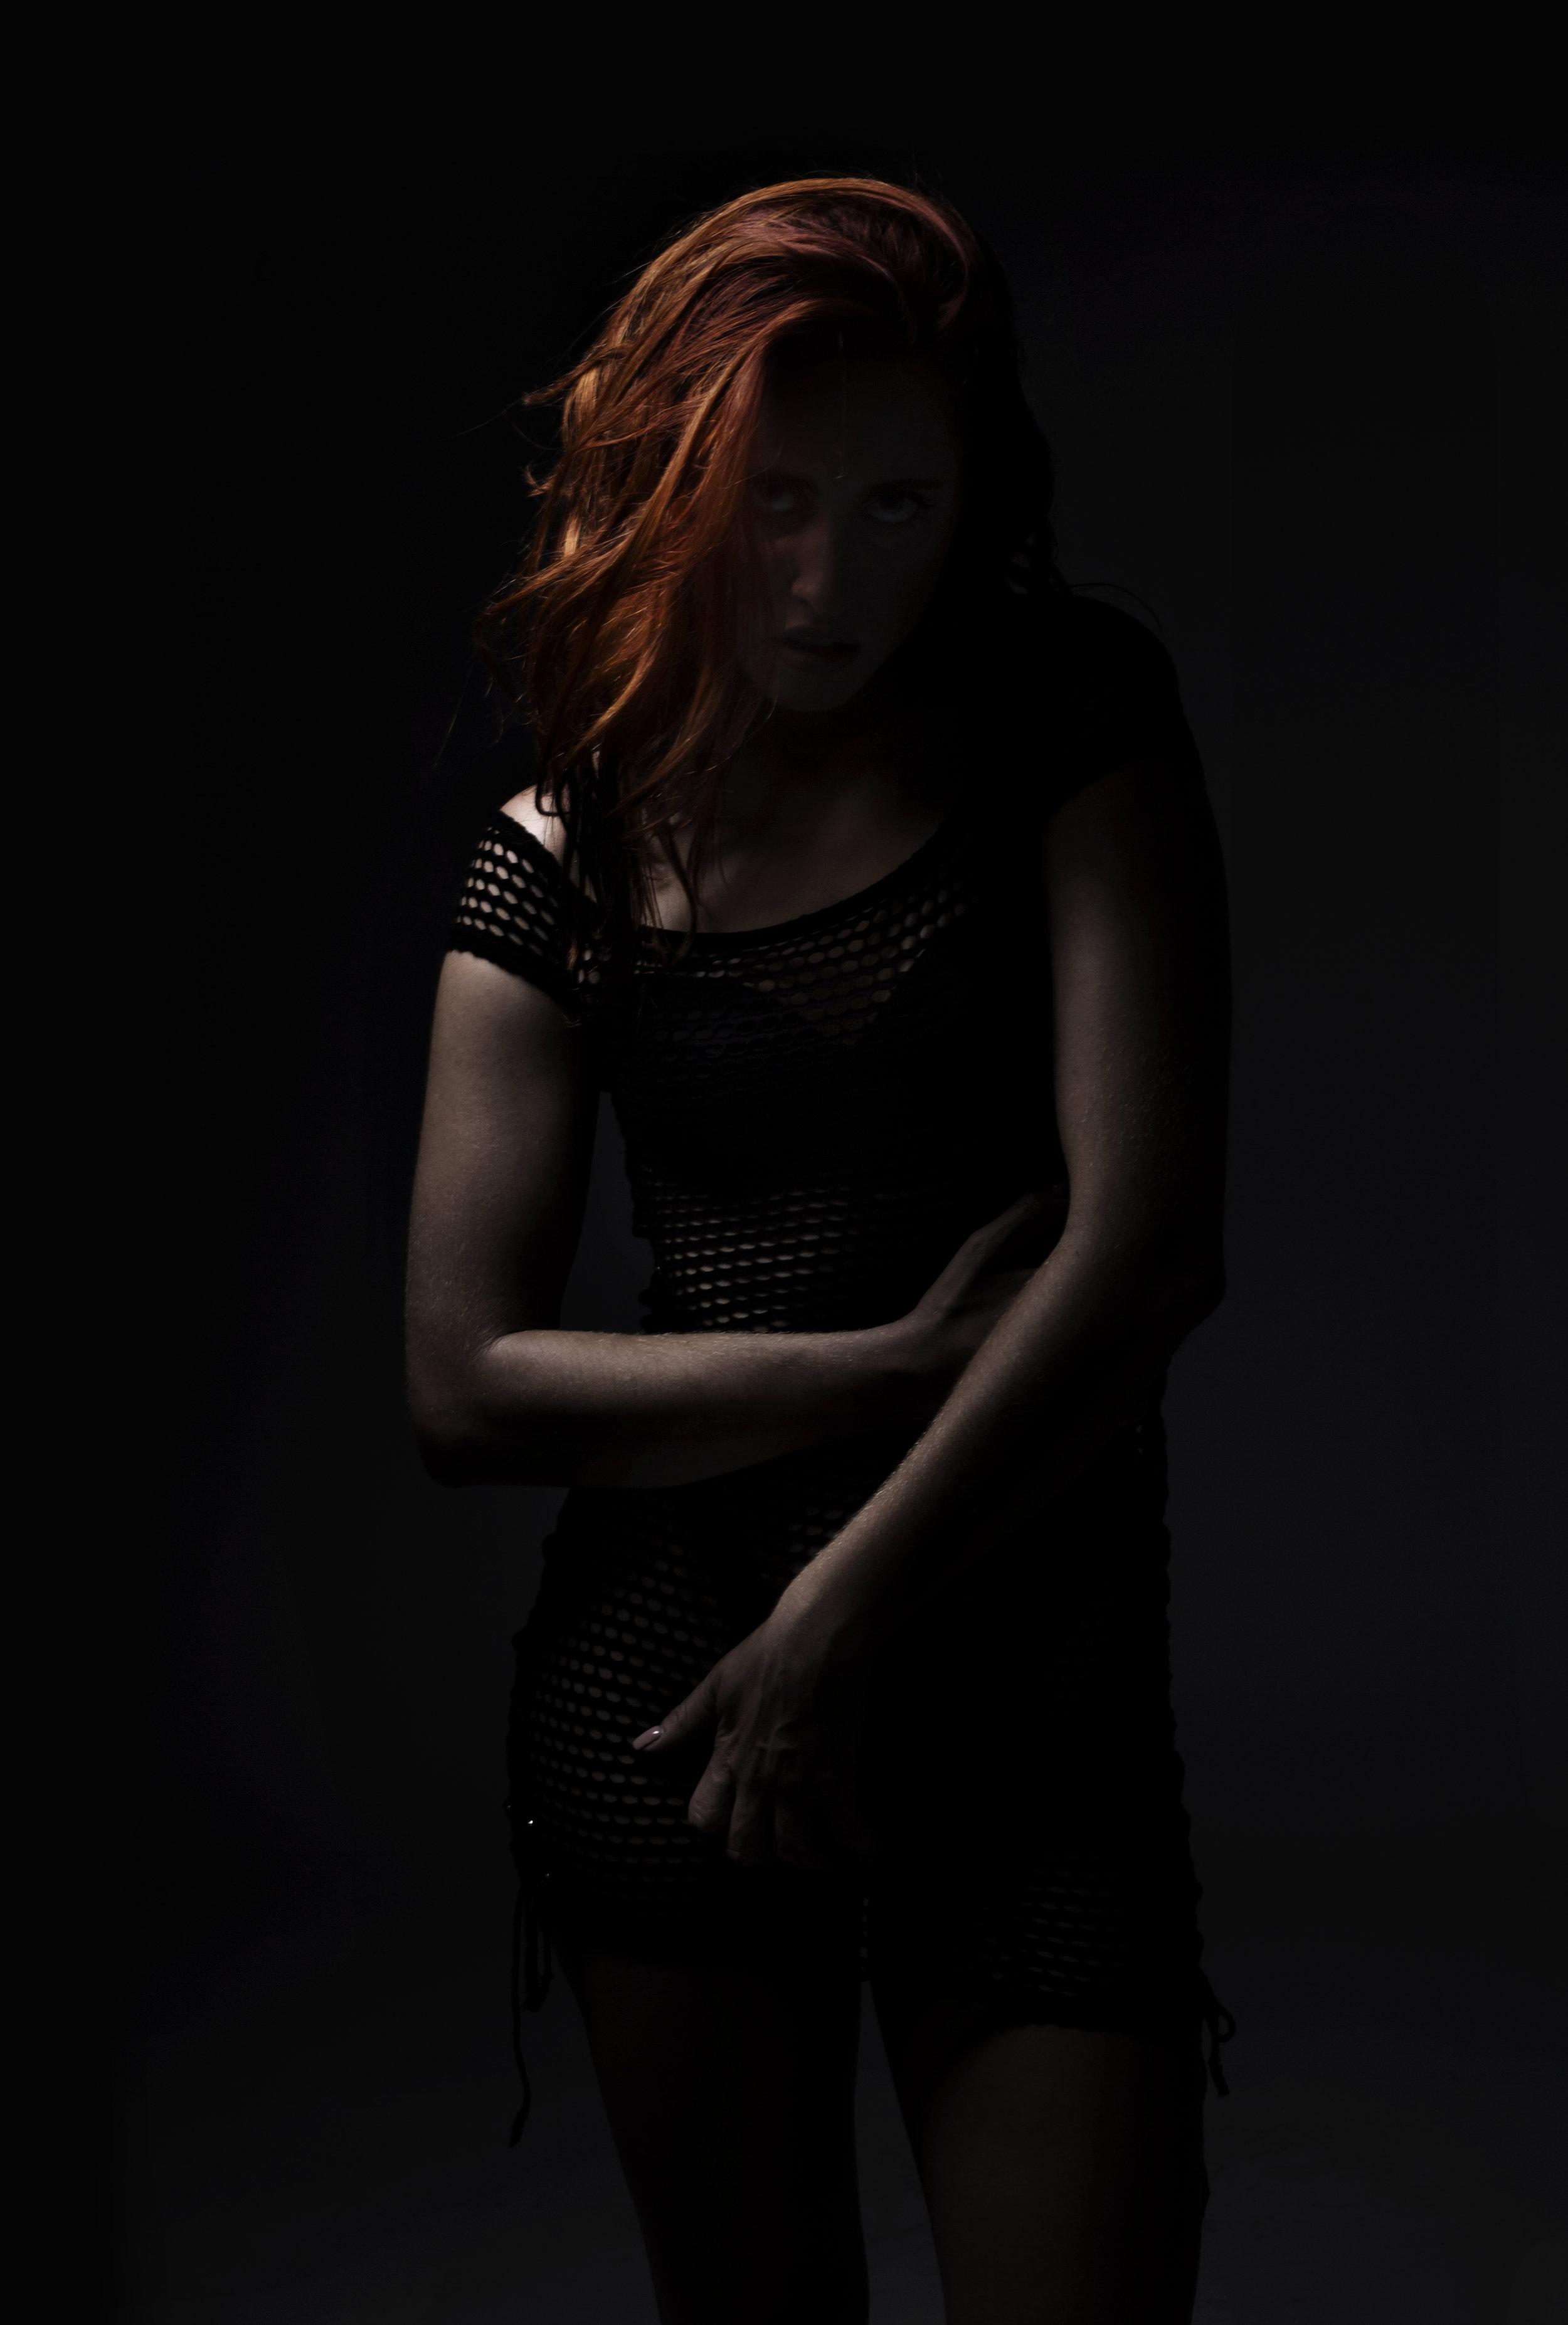 Anna_Dark_New_02.jpg